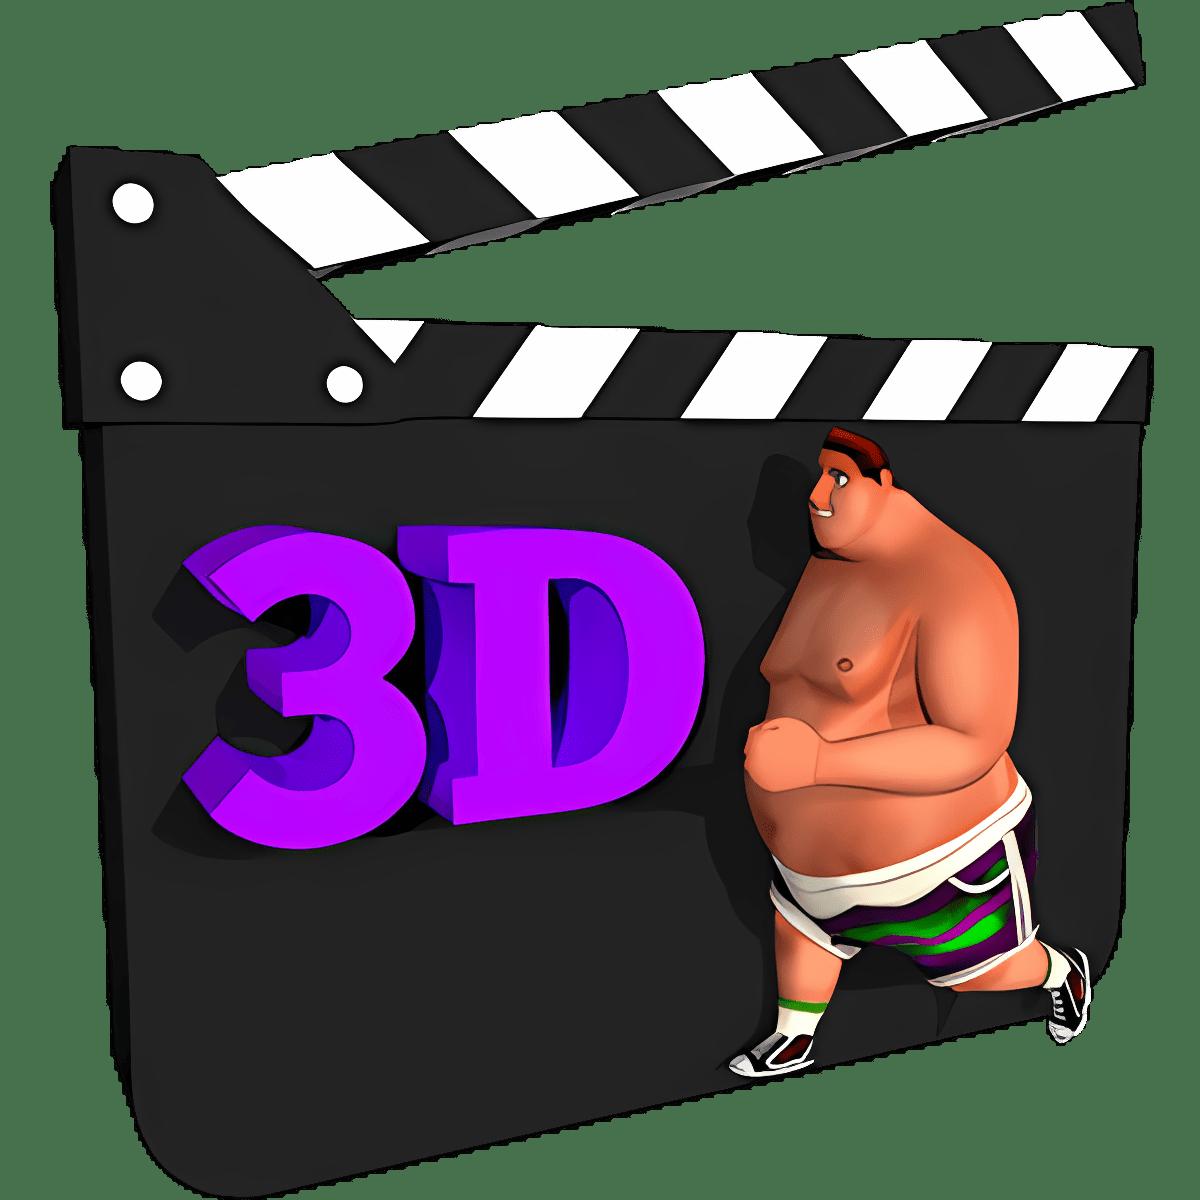 Iyan 3d - Make 3d Animations